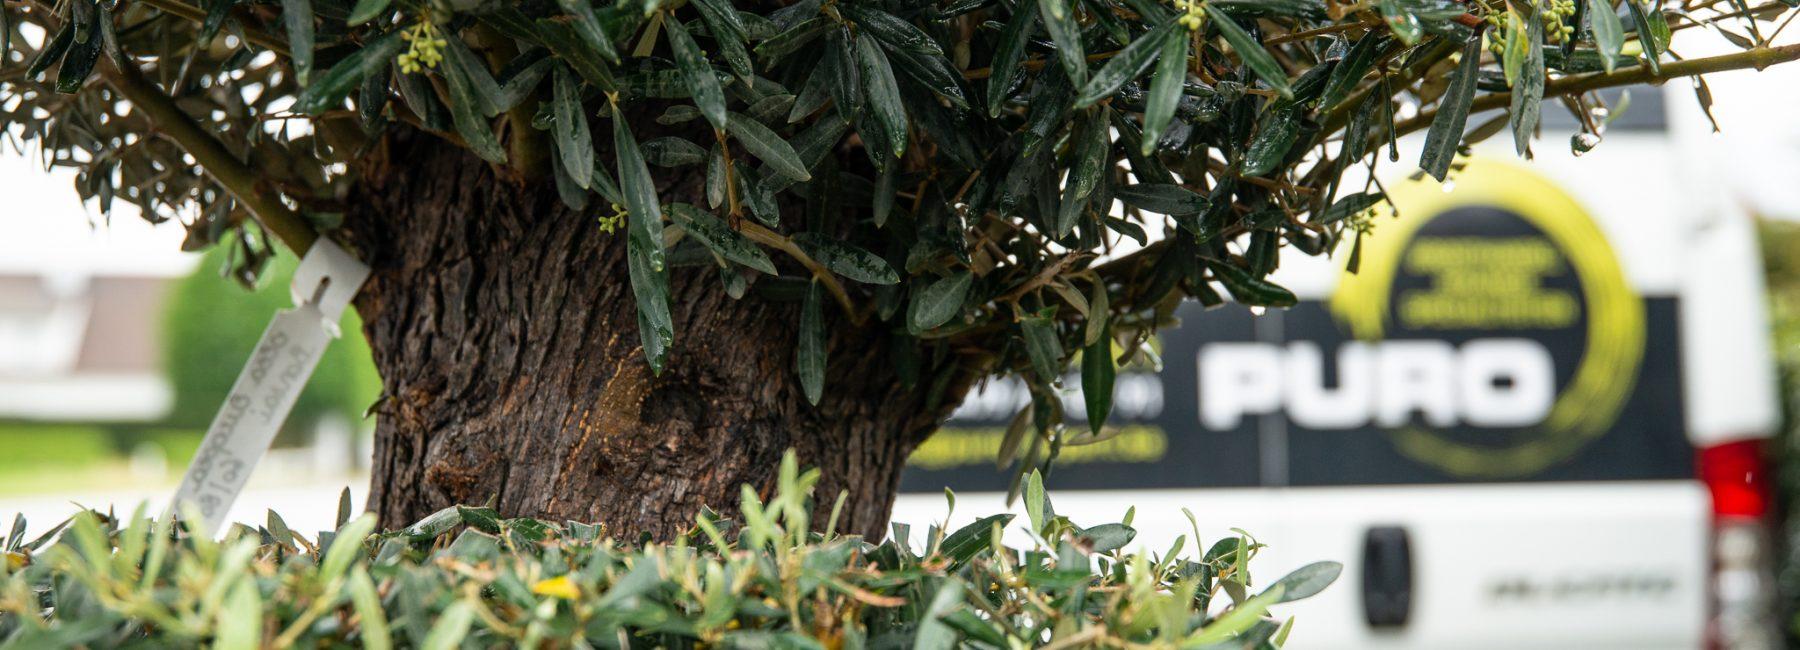 Puro Bomen